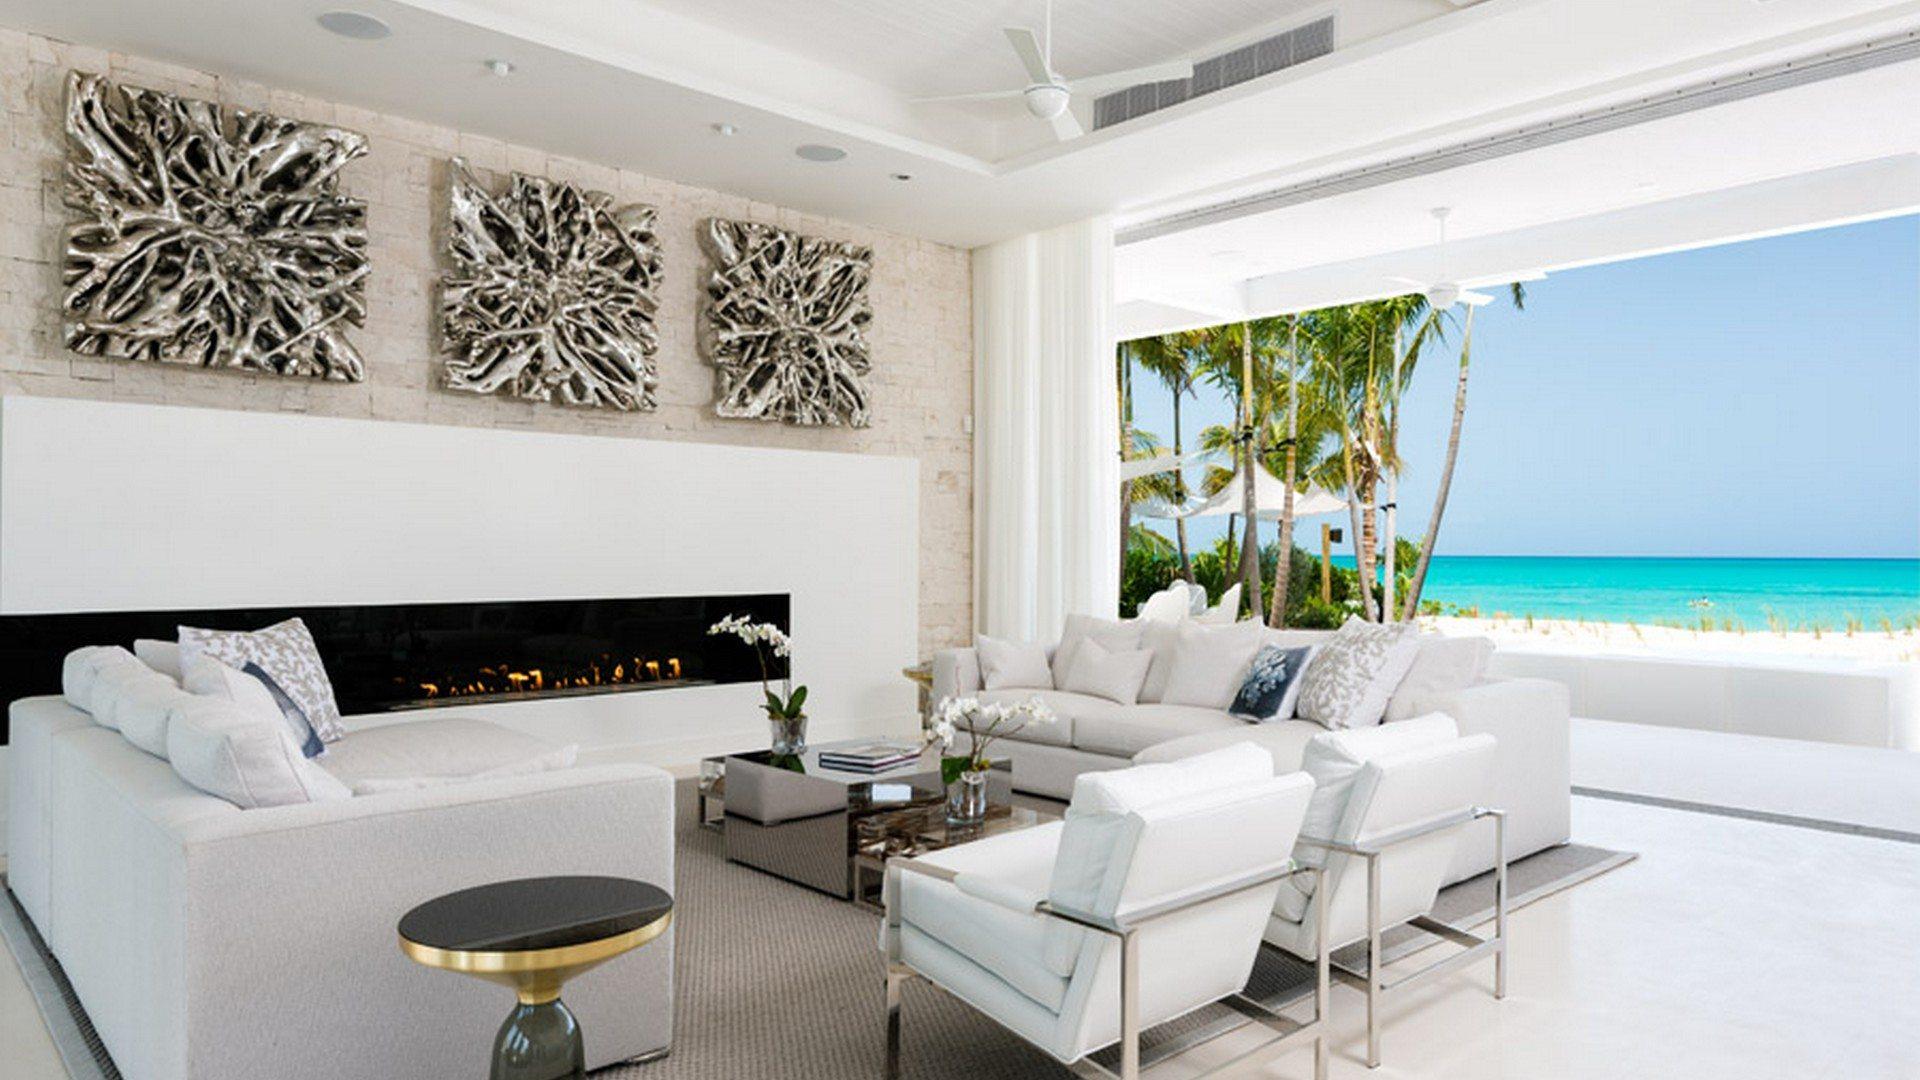 Awa-Living-Room-Turks-and-Caicos-In-Villas-Veritas-UltraVilla